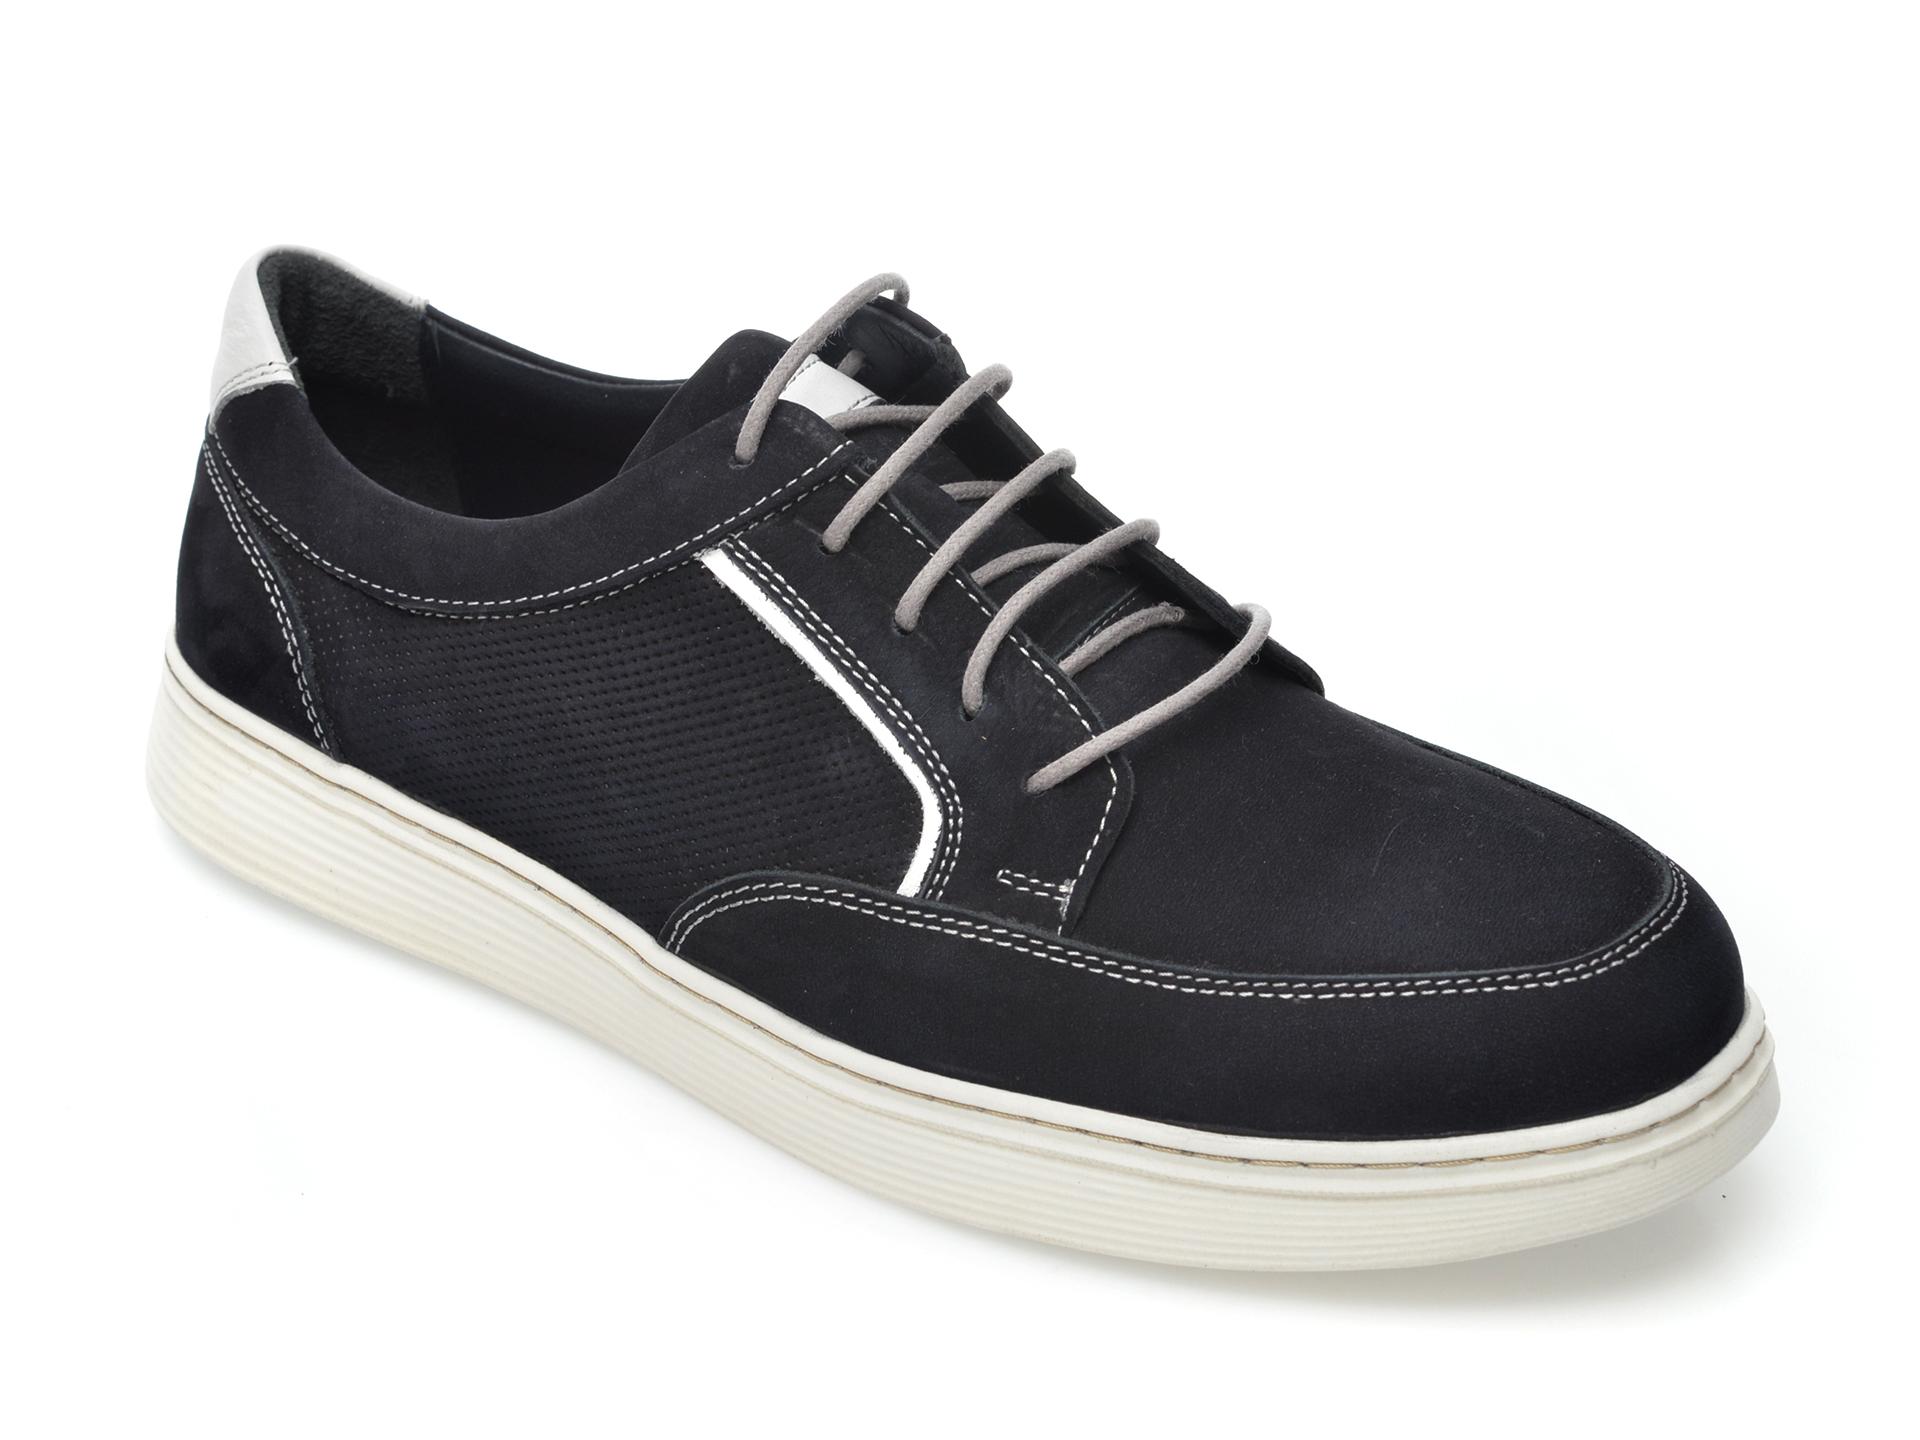 Pantofi OTTER bleumarin, 204108, din nabuc New